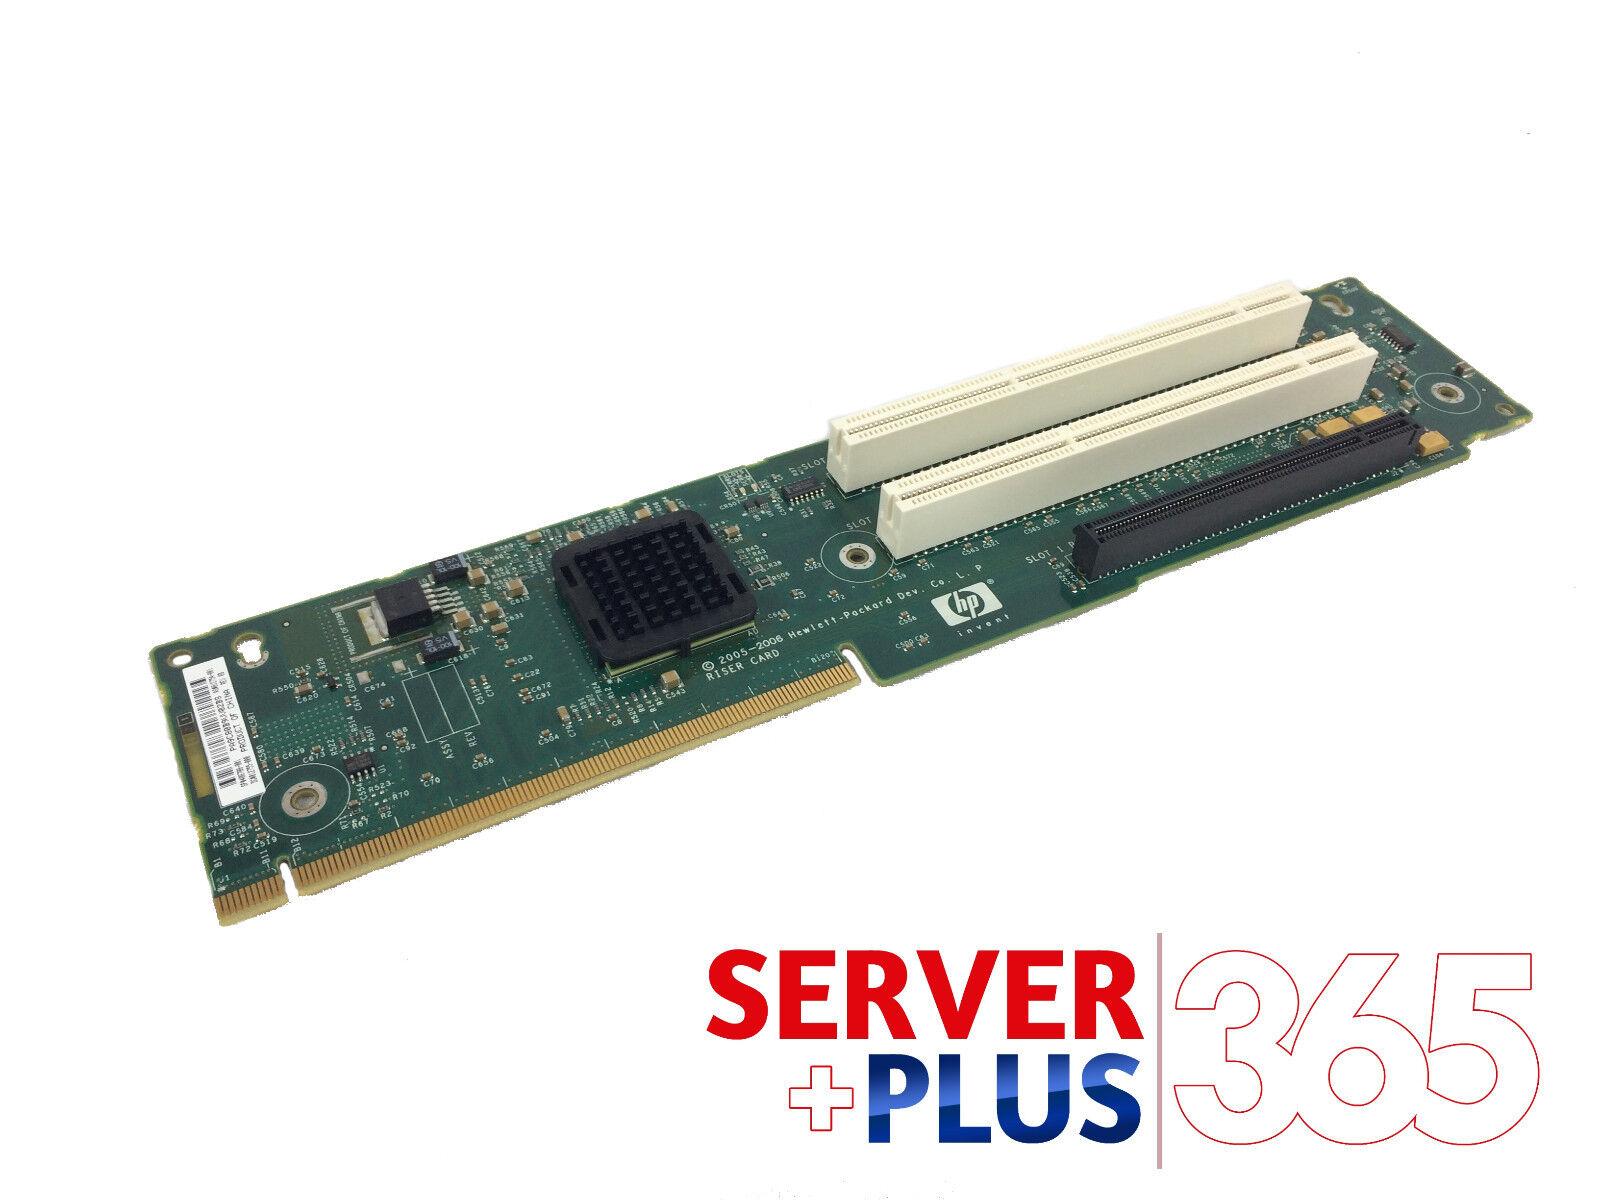 10 AVAILABLE New HP PCI-X//PCI-E NHP Riser Card DL380 DL380G5 P//N 410570-B21